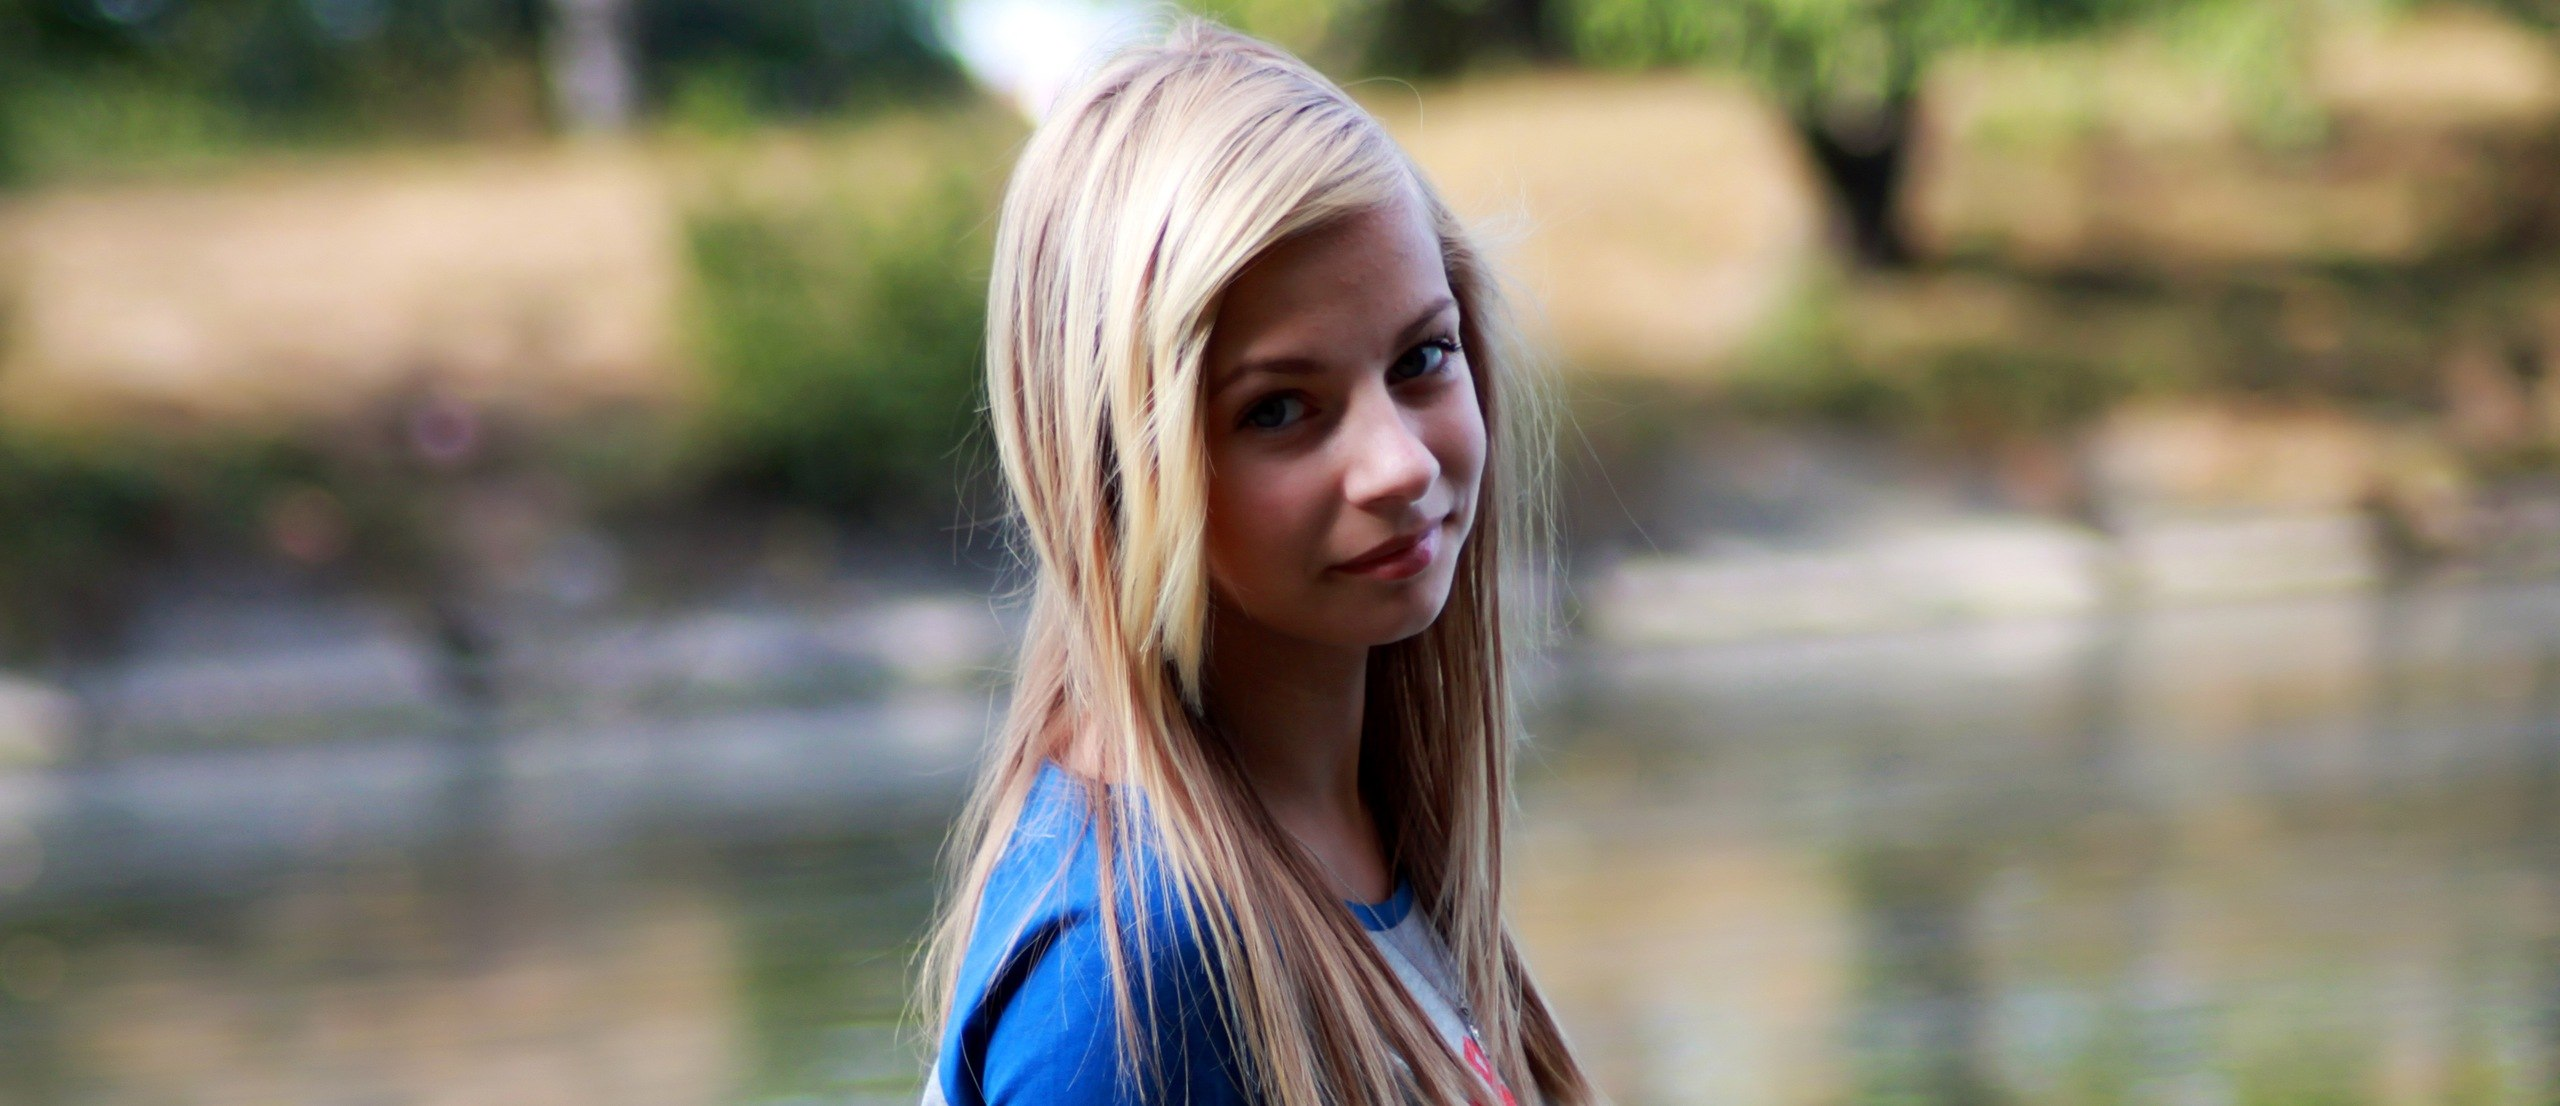 Бесплатно пизденки девок видео знакомства 4